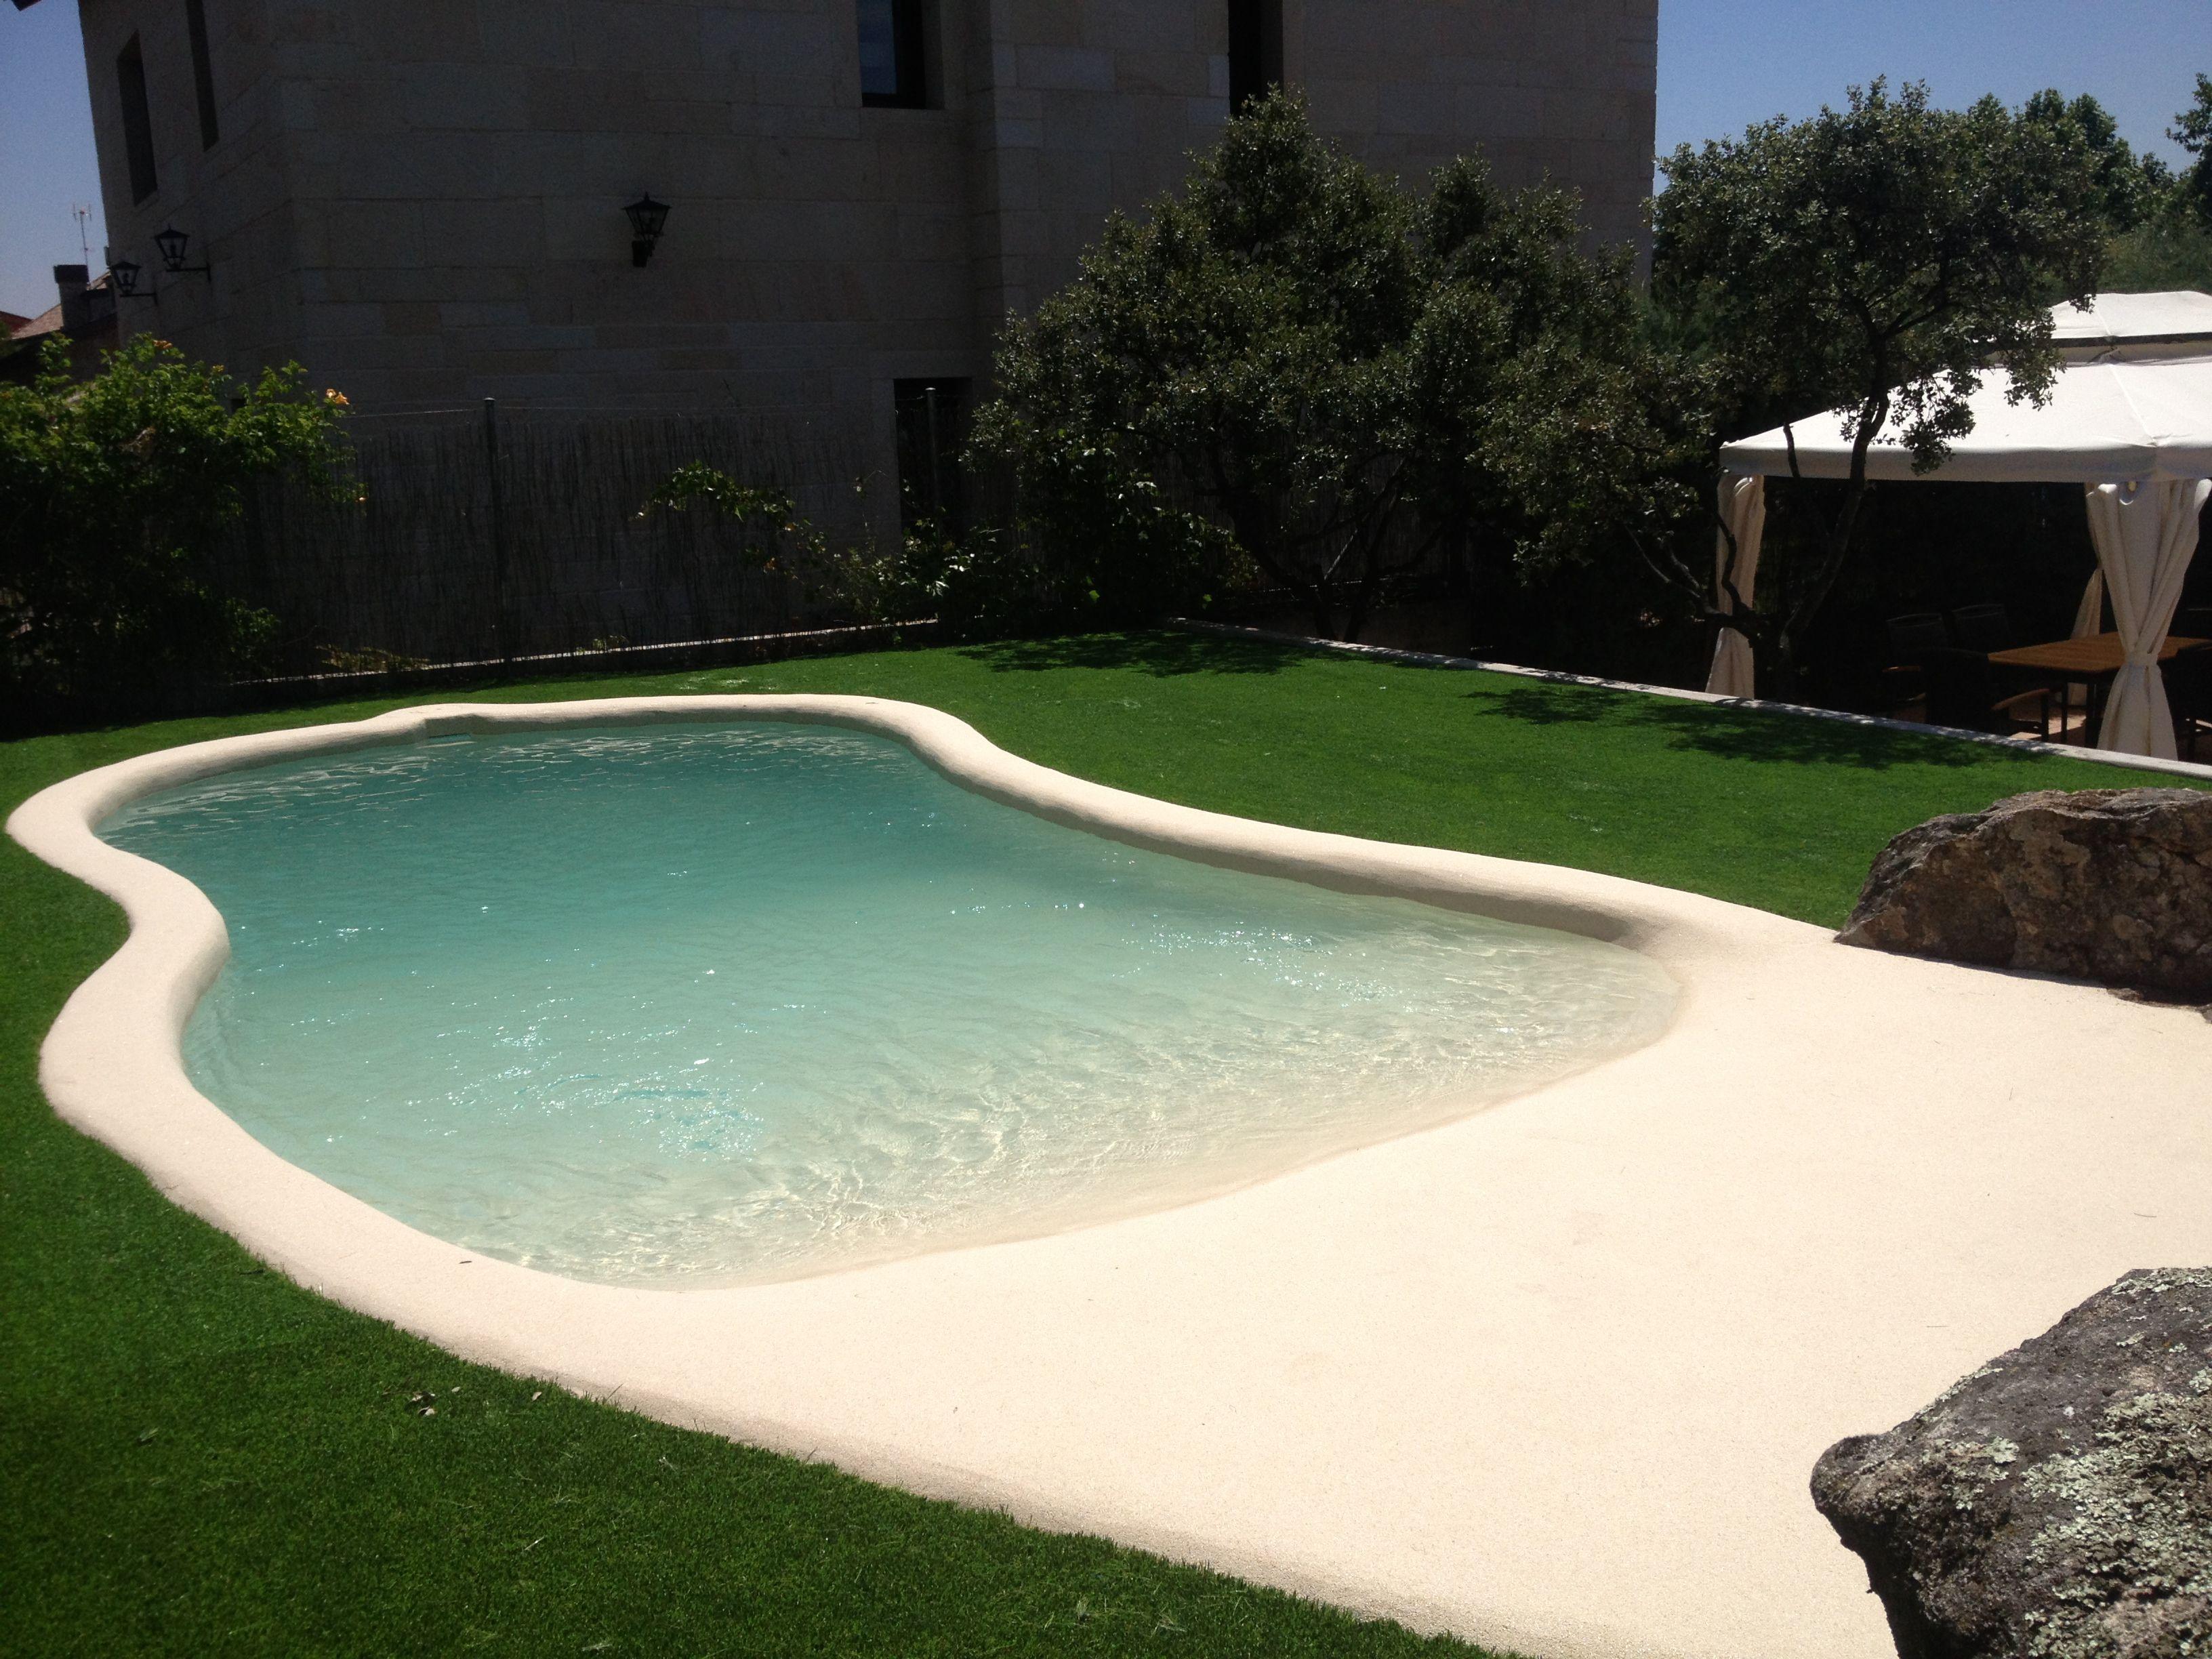 Preciosa piscina de arena situada en el jard n de una for Piscina torrelodones